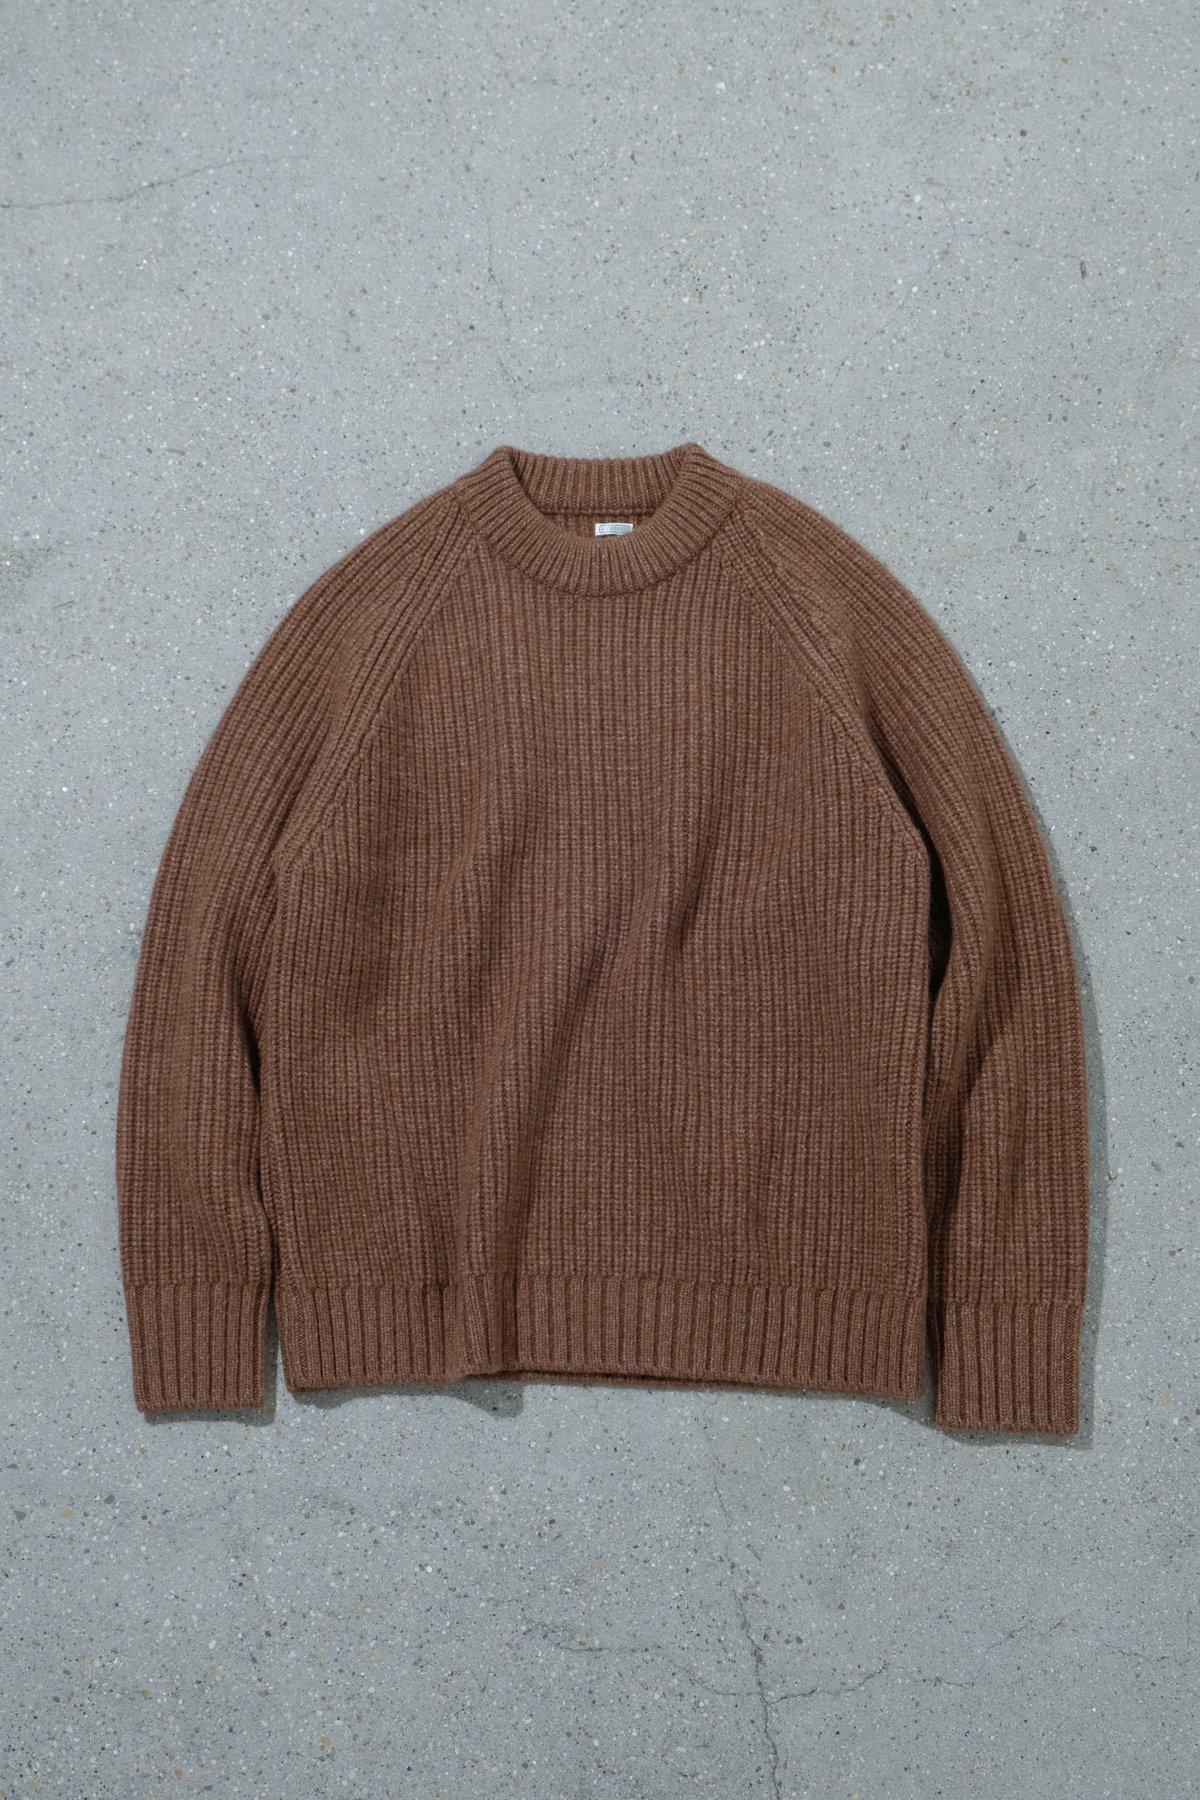 A.PRESSE / Fisherman Pullover Sweater